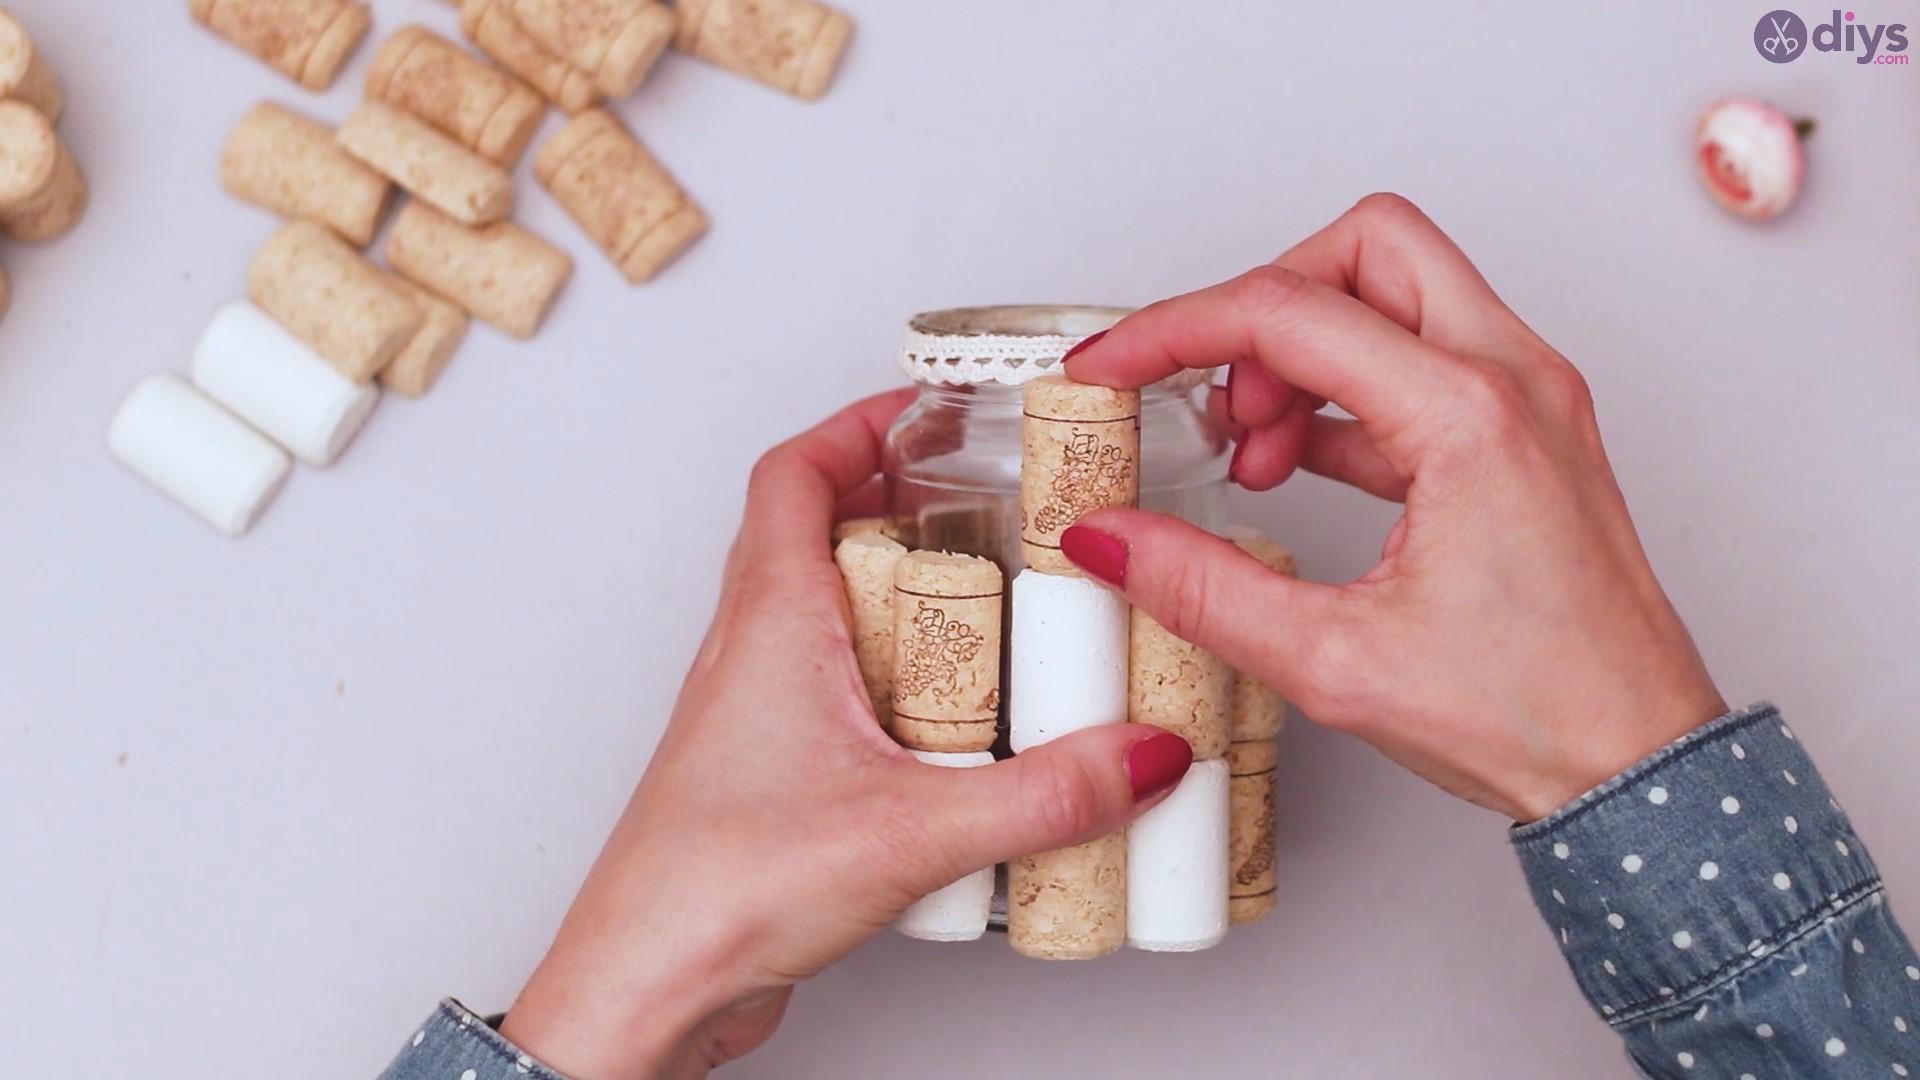 Diy wine cork flower vase (23)